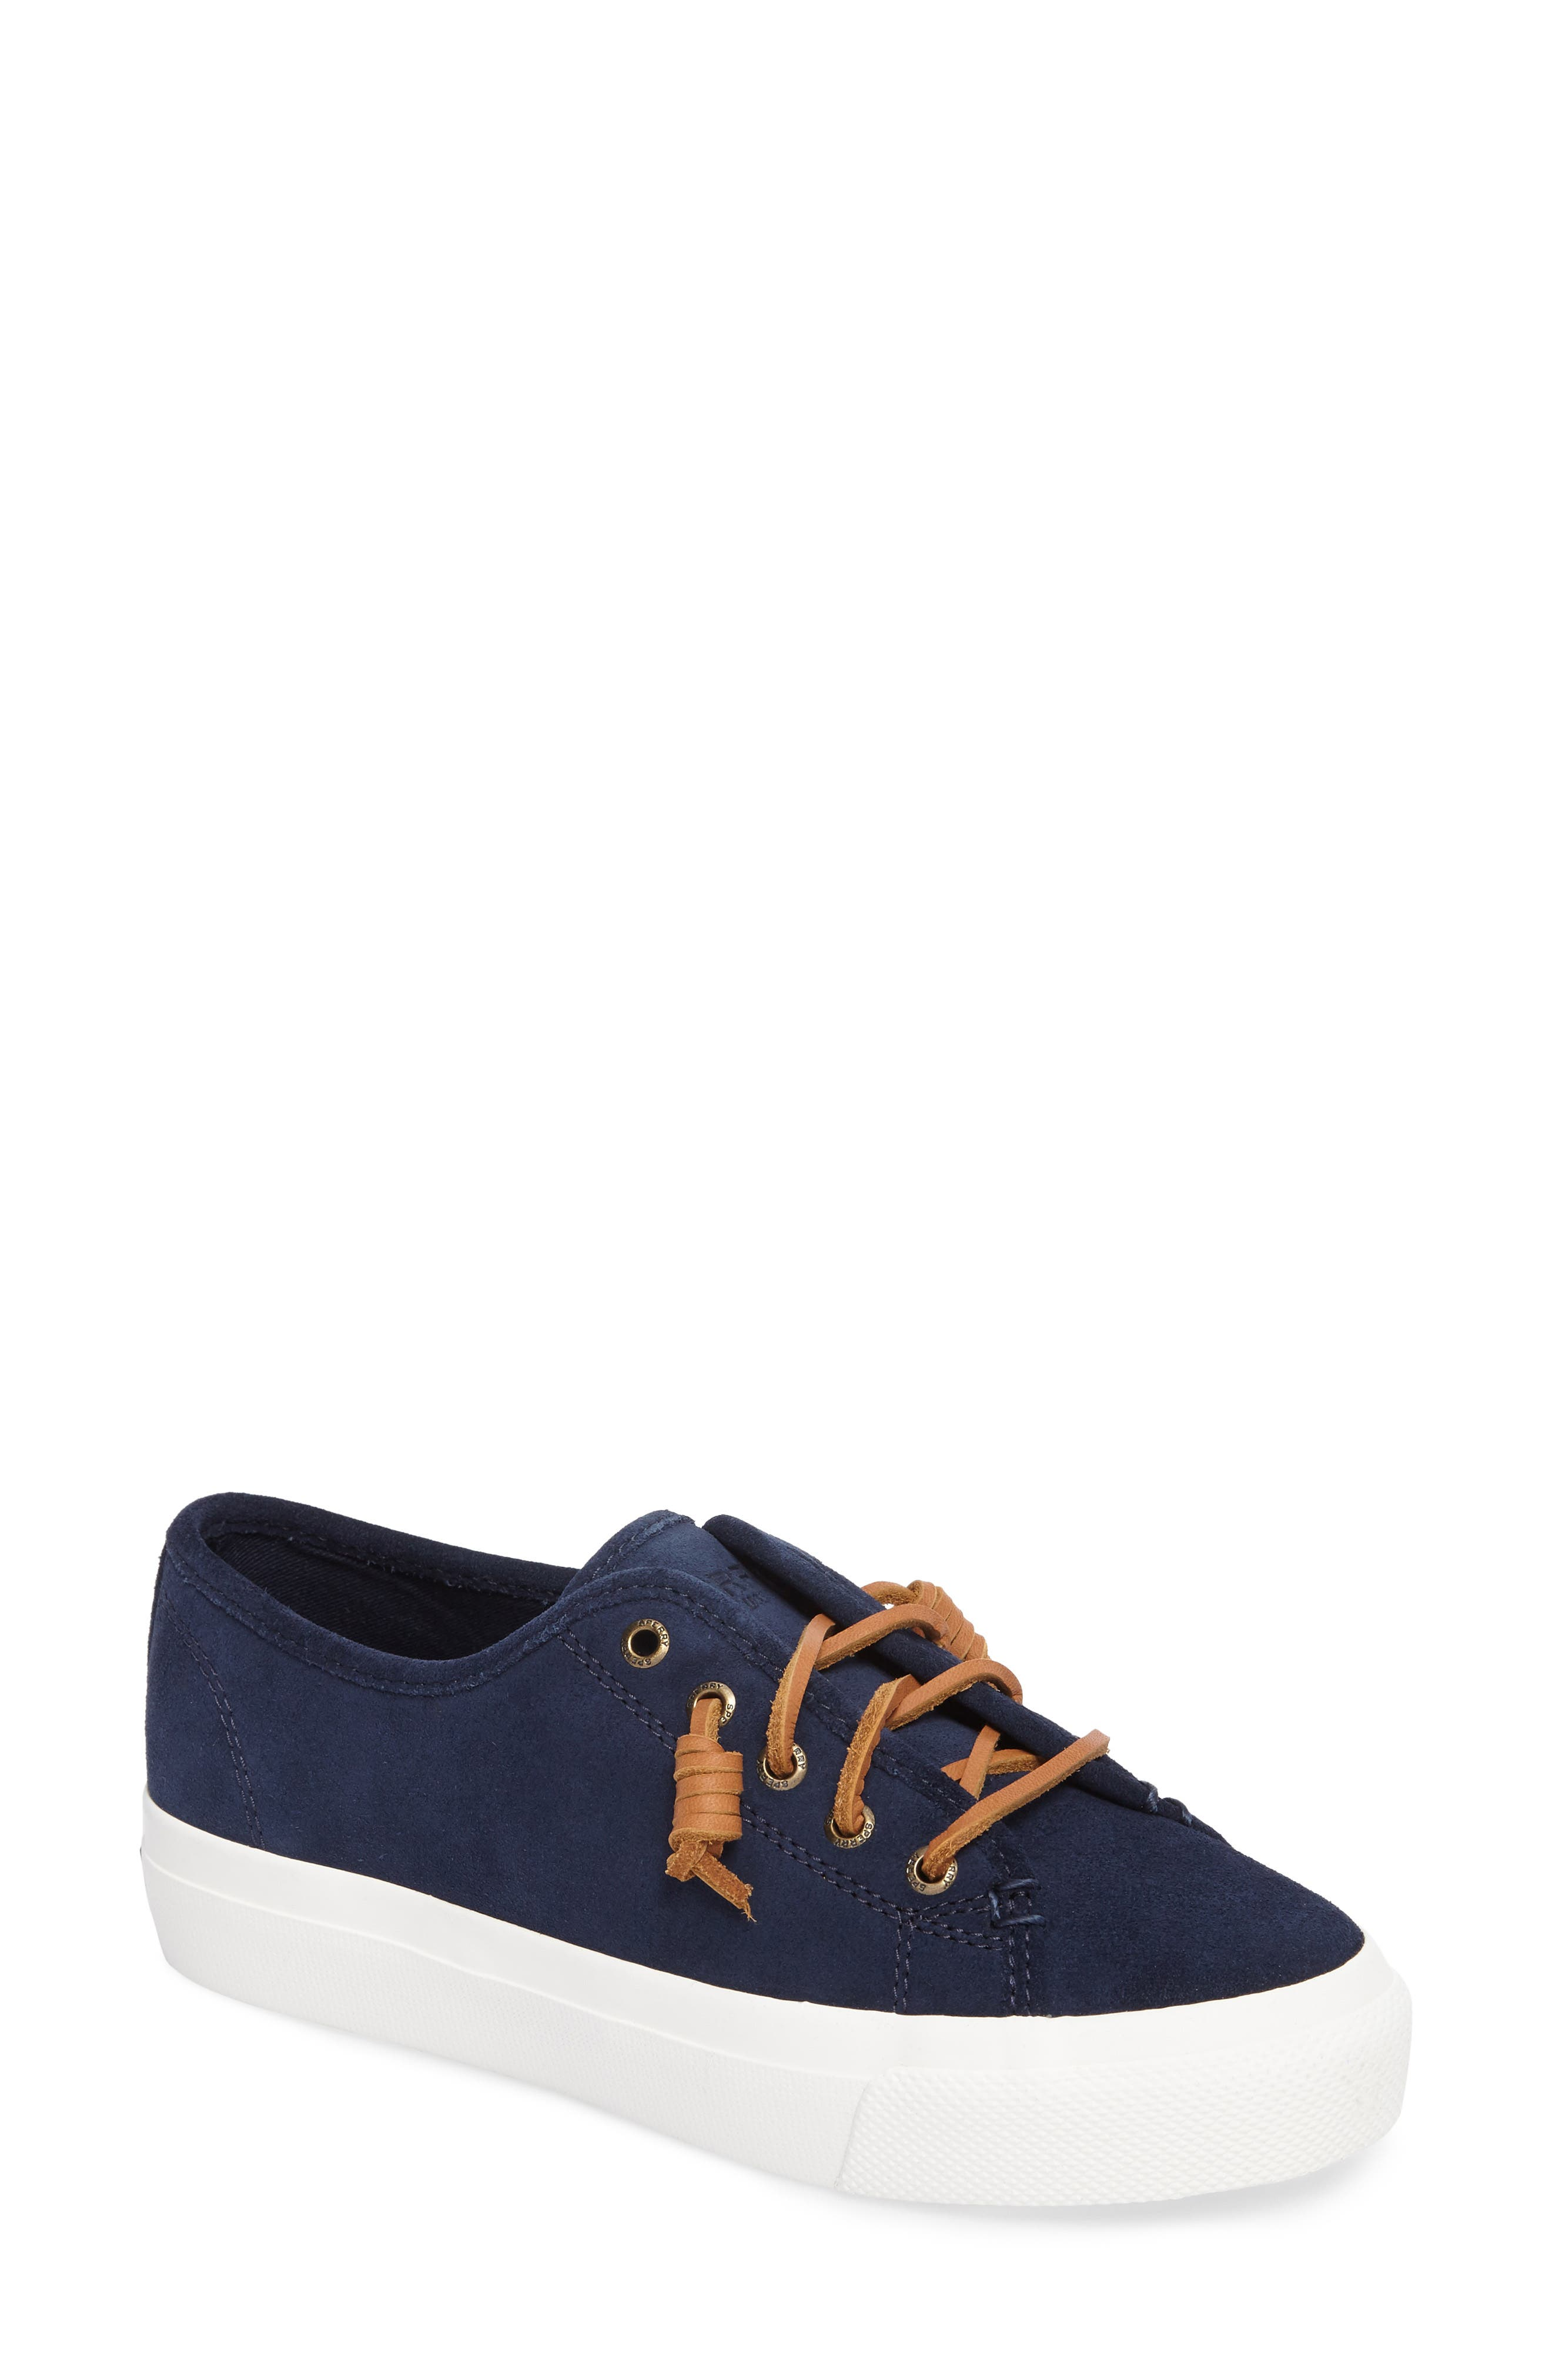 Sky Sail Platform Sneaker,                             Main thumbnail 1, color,                             Navy Suede